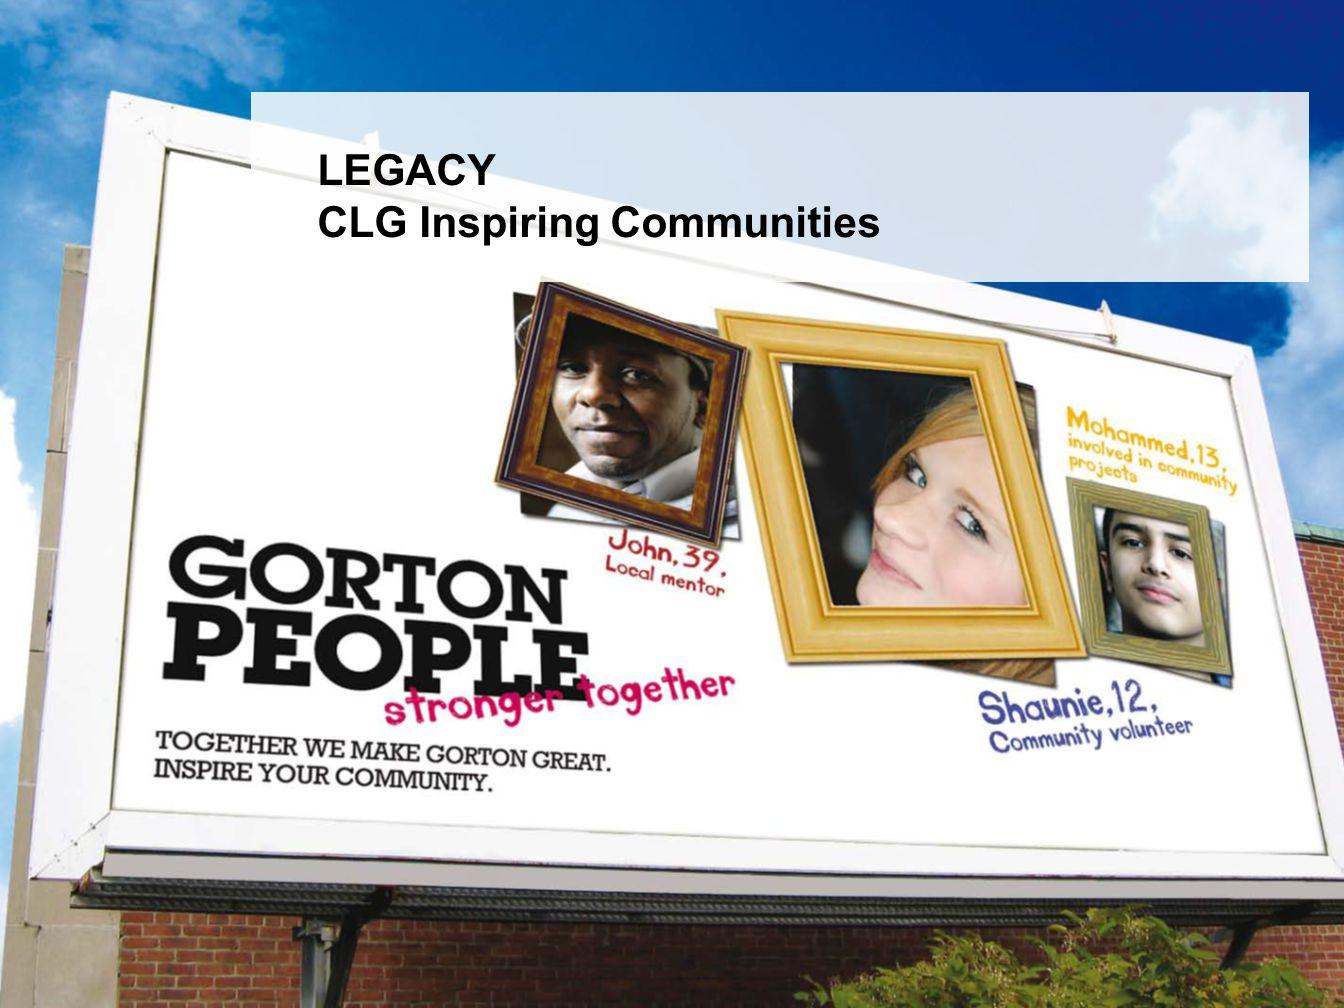 LEGACY CLG Inspiring Communities